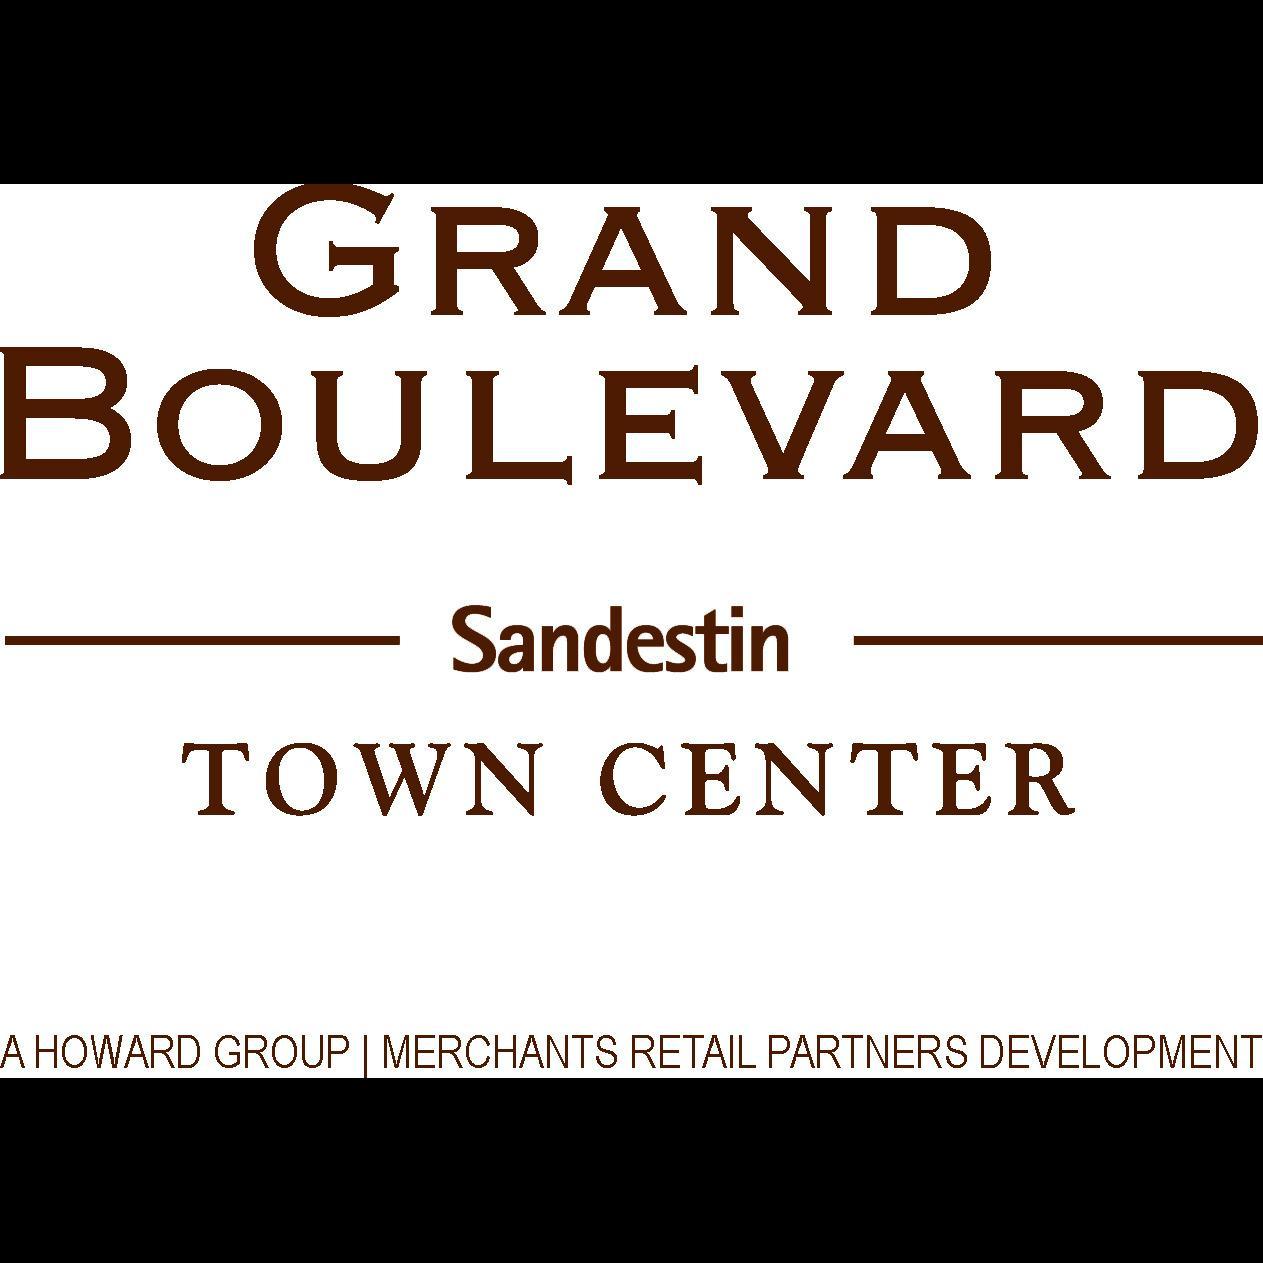 Grand Boulevard at Sandestin